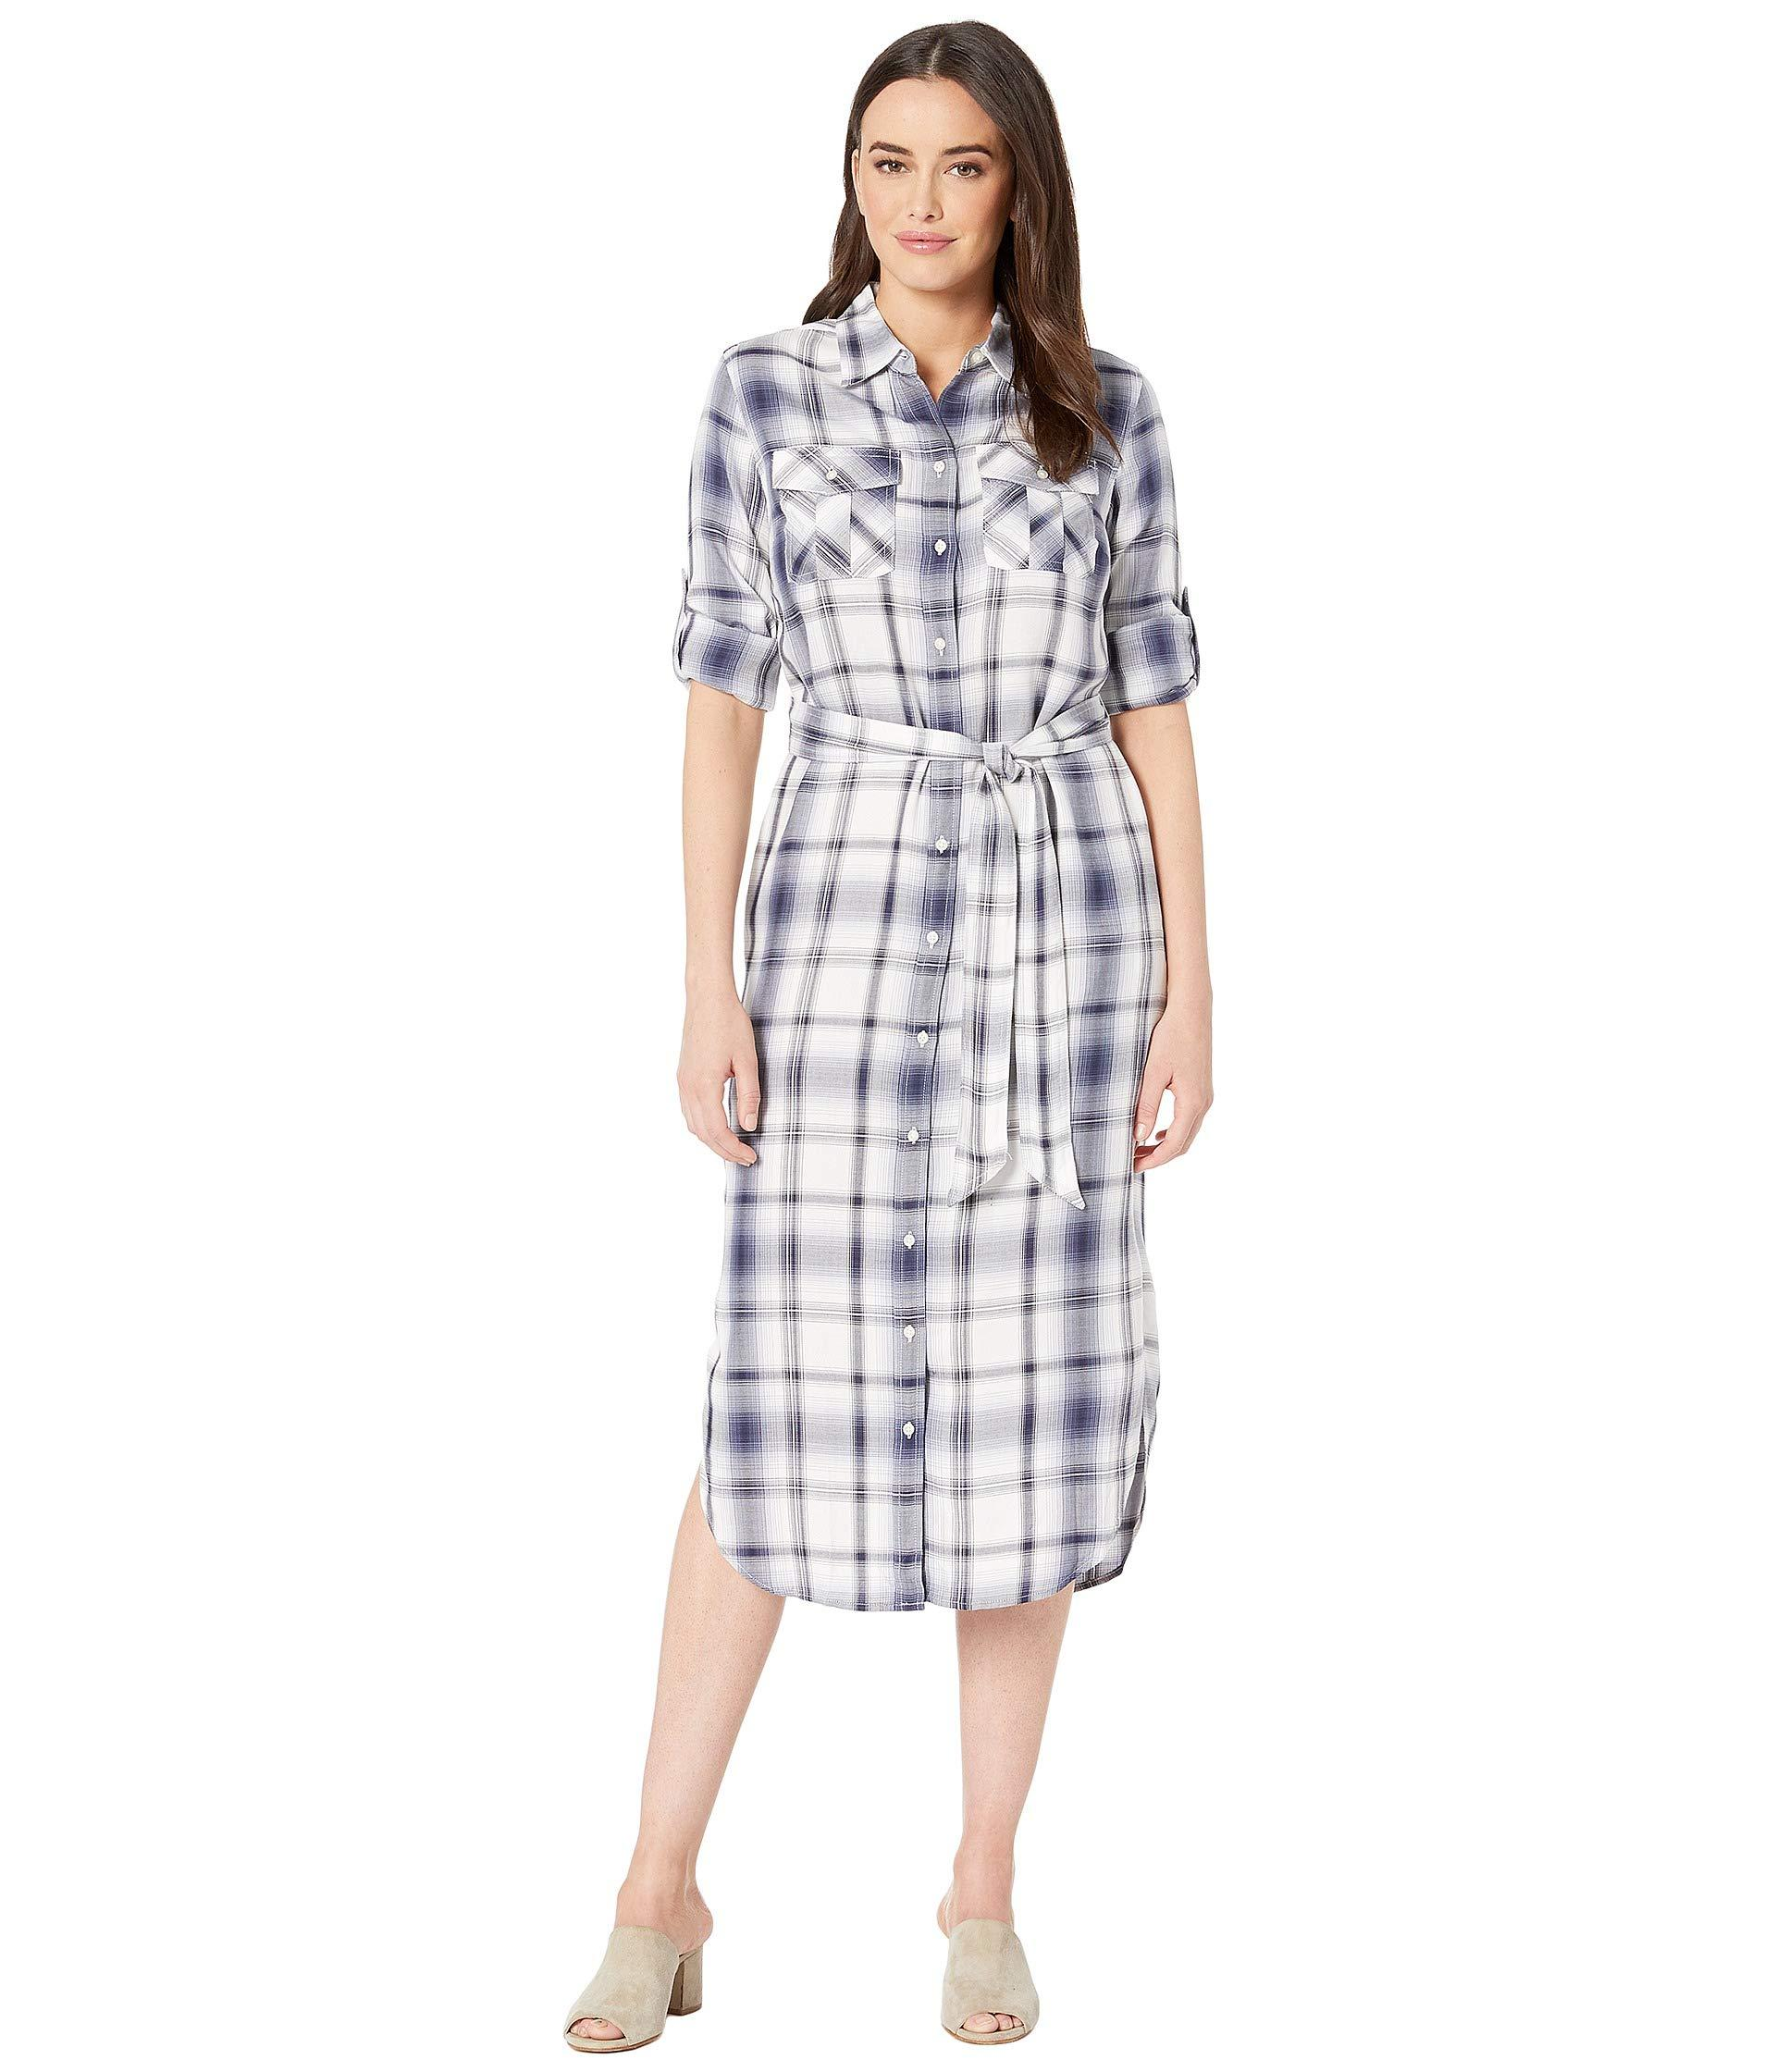 a8e6f6463eda8 Lyst - Lauren by Ralph Lauren Plaid Herringbone Shirtdress (navy ...